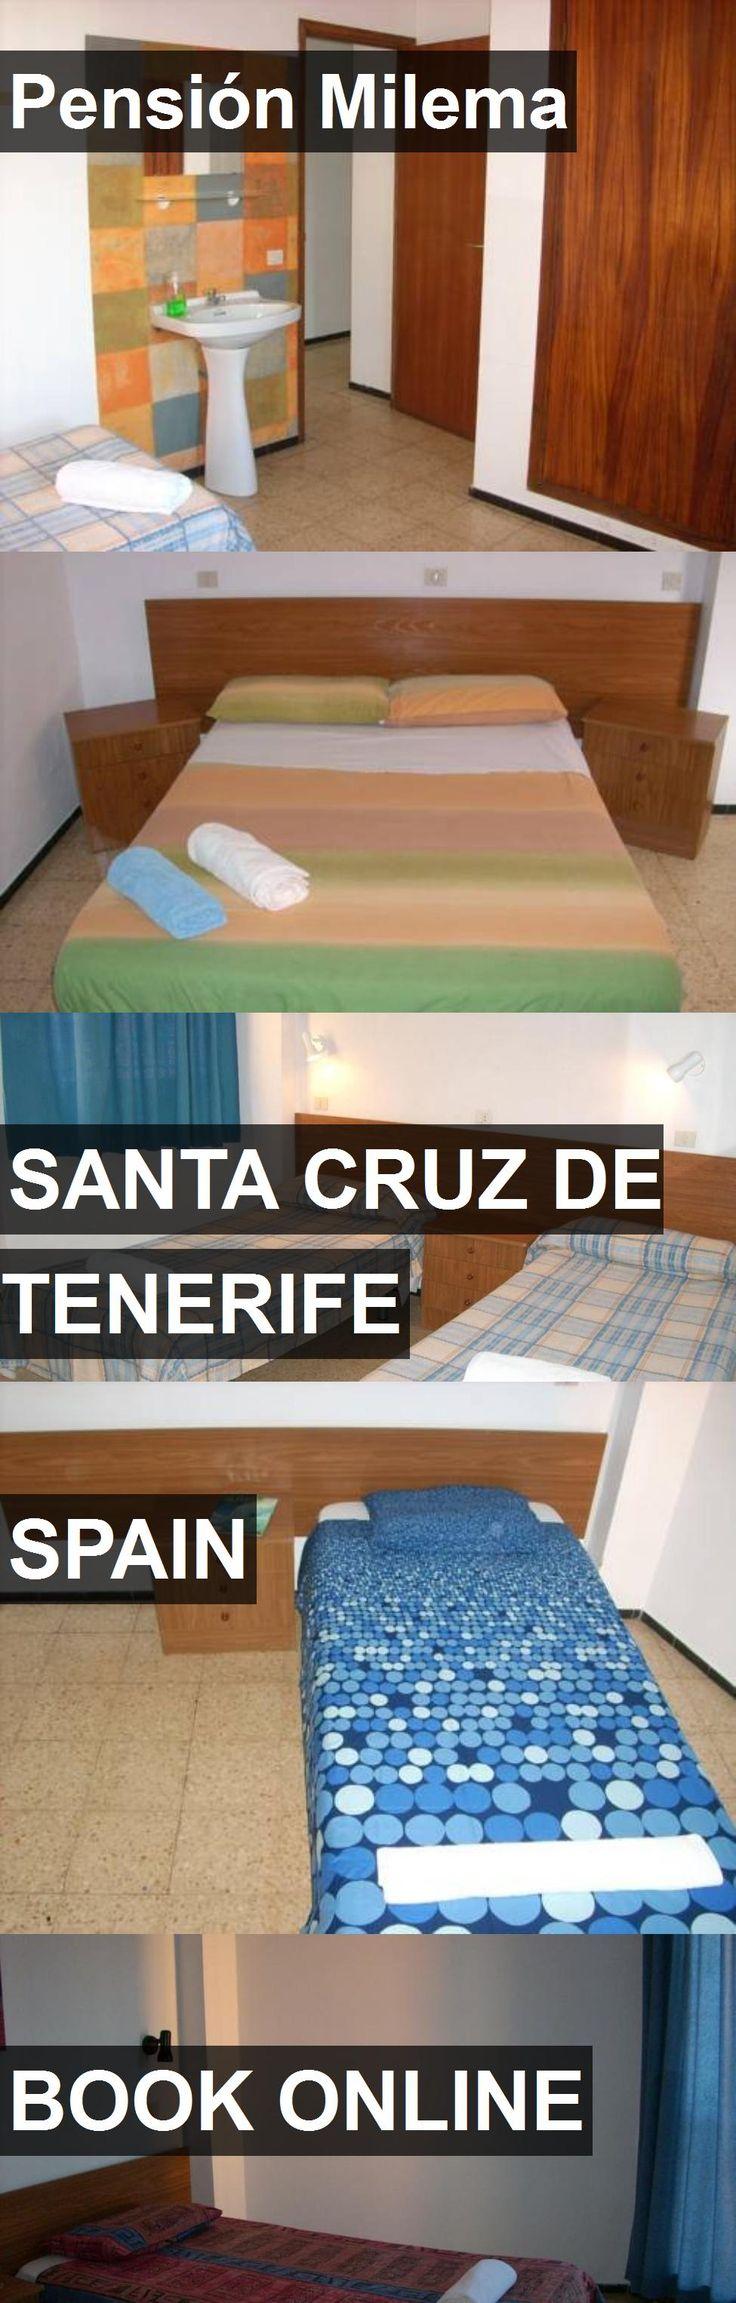 Hotel Pensión Milema in Santa Cruz de Tenerife, Spain. For more information, photos, reviews and best prices please follow the link. #Spain #SantaCruzdeTenerife #hotel #travel #vacation